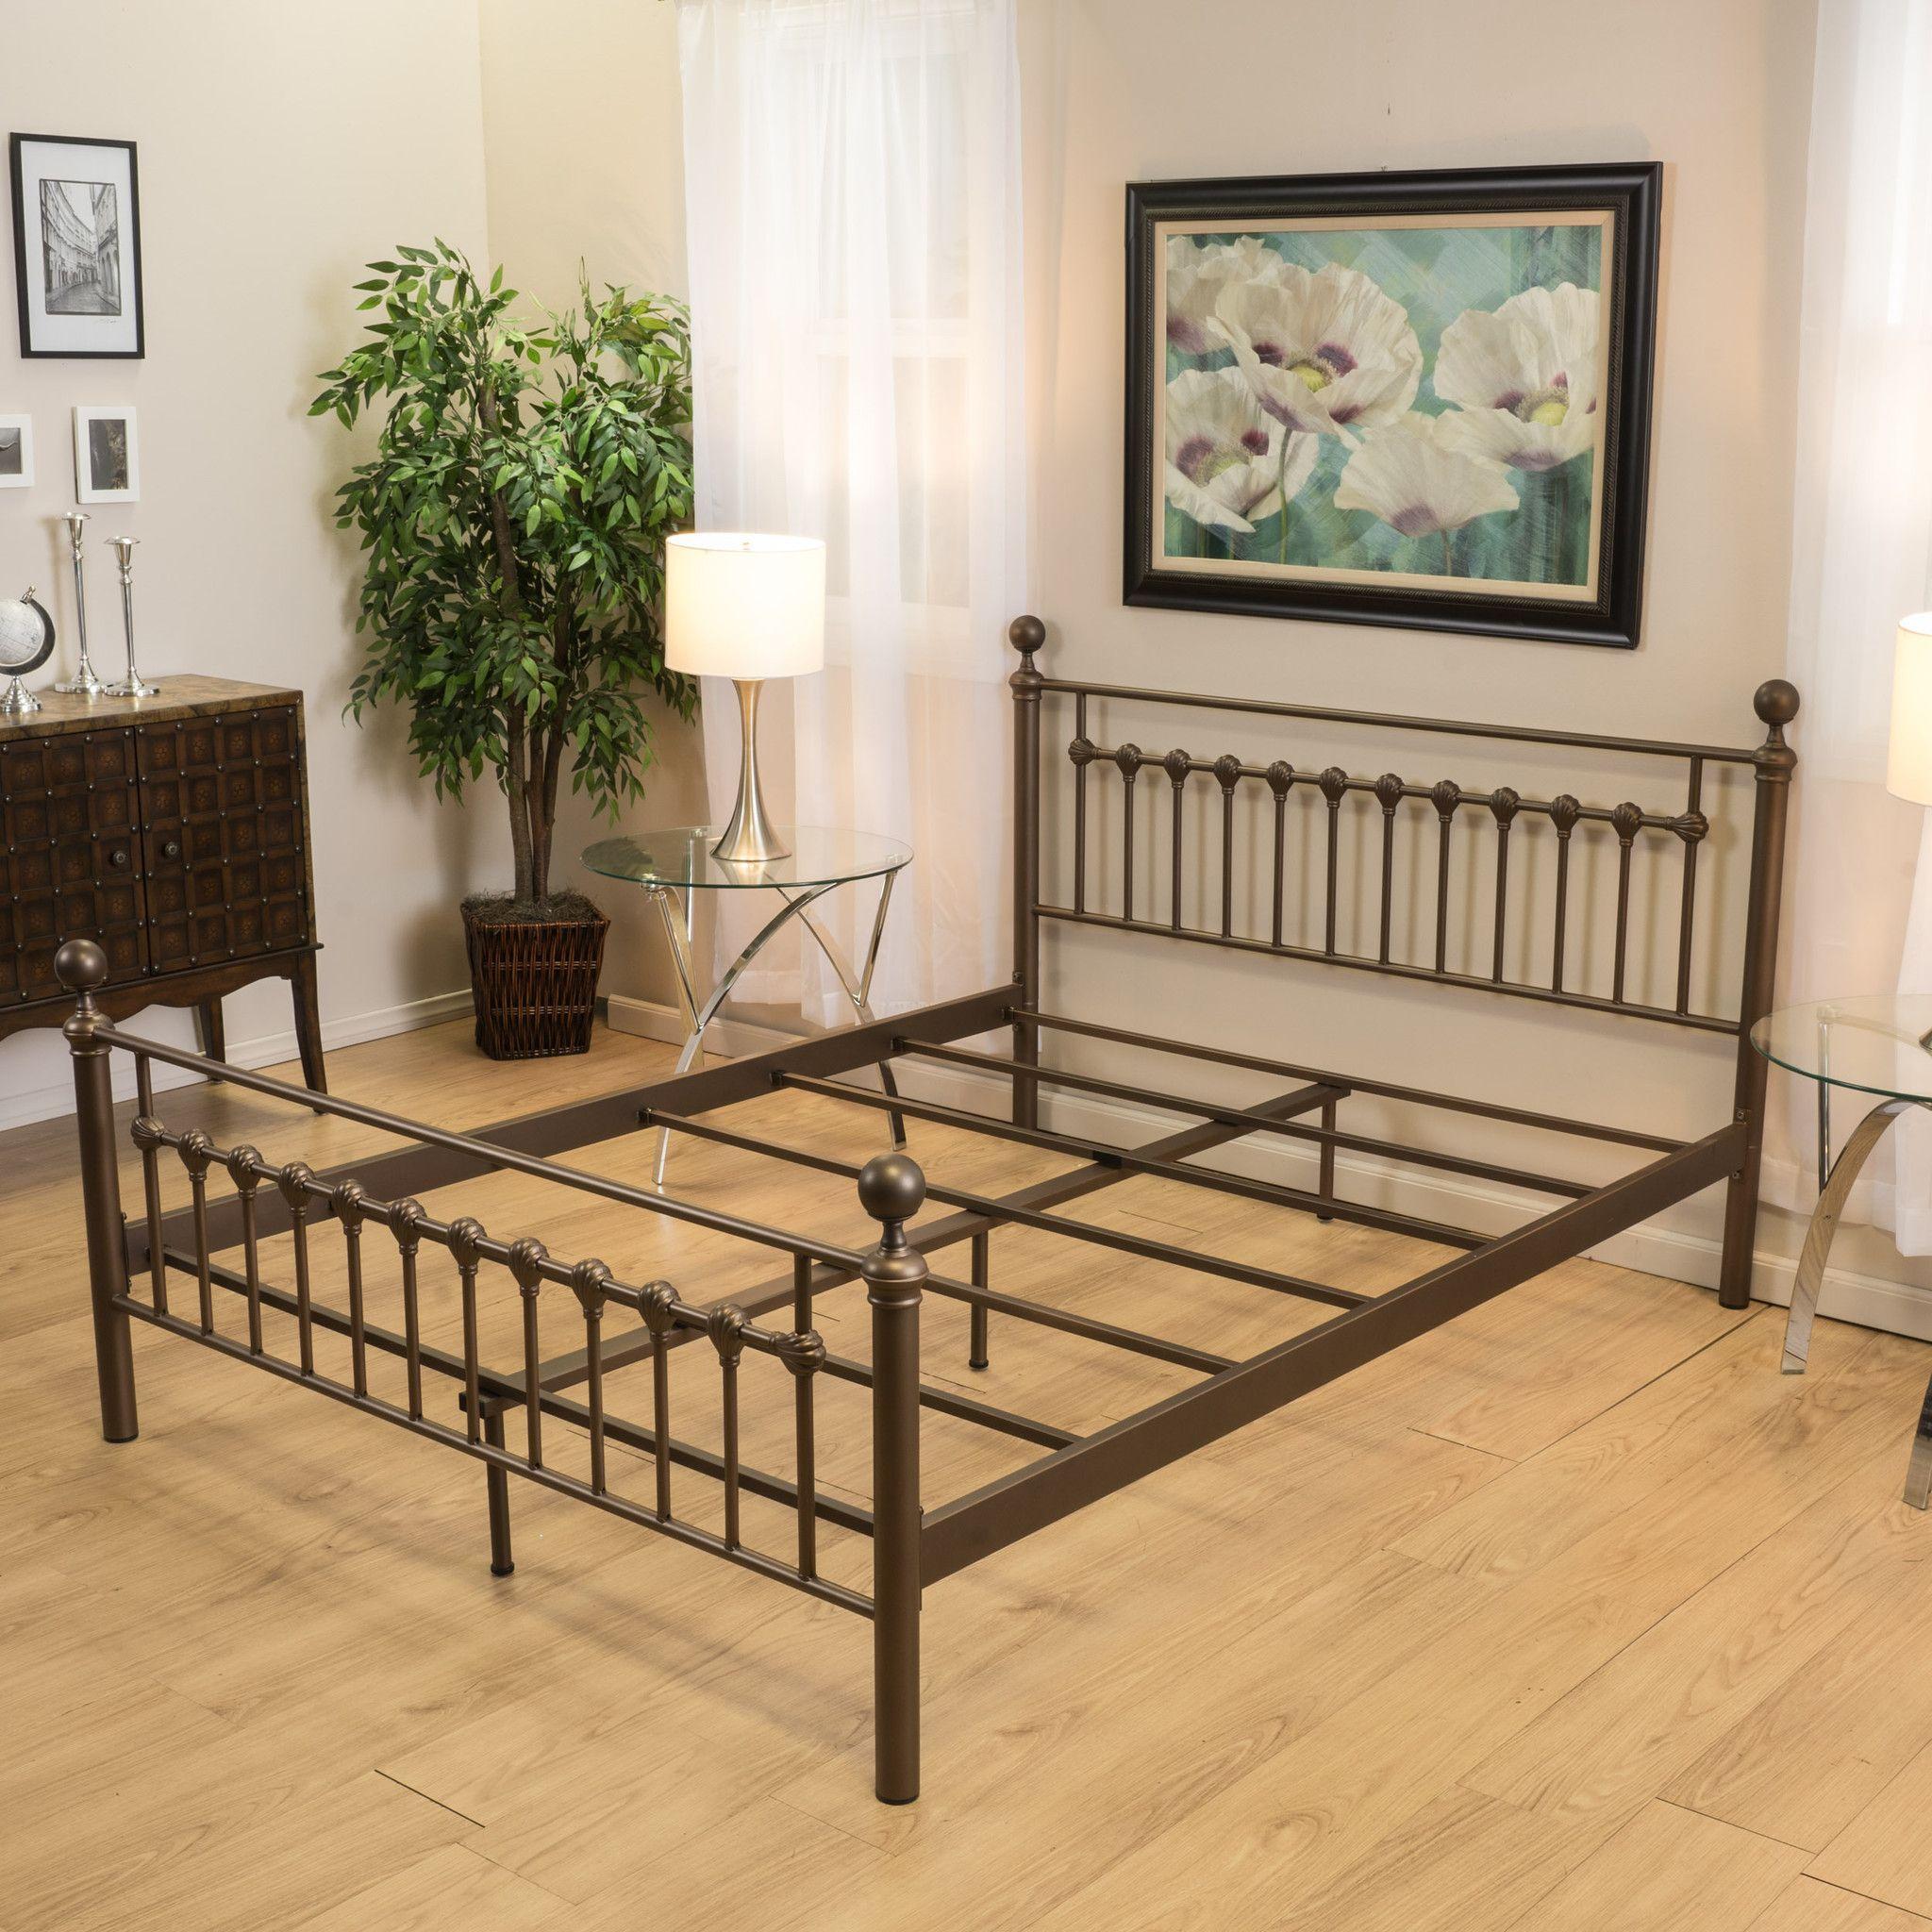 Bradford Queen Size Brown Bed Frame   Muebles de hierro, Hierro ...